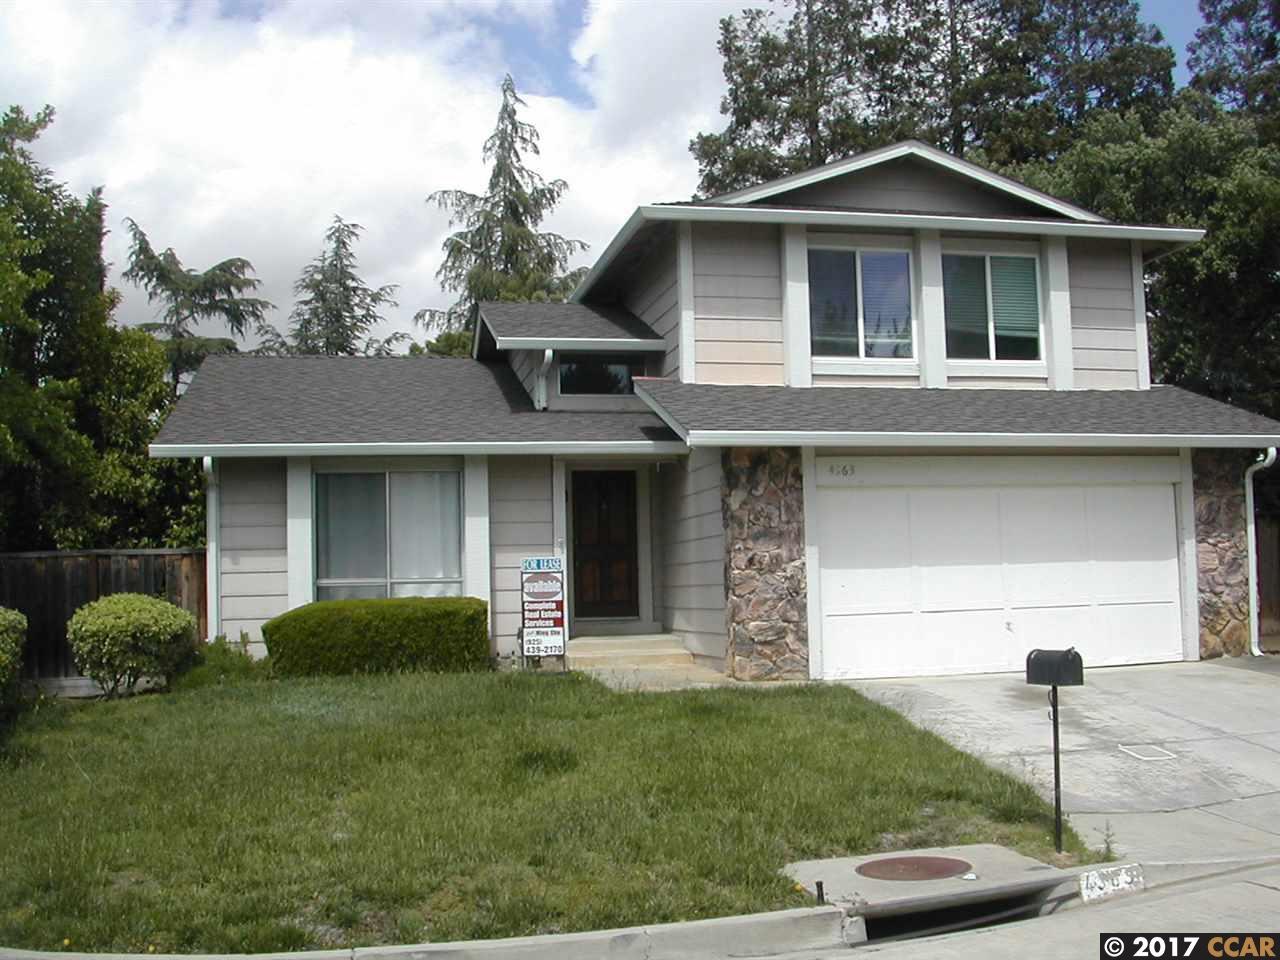 واحد منزل الأسرة للـ Rent في 4363 KEARSARGE Court 4363 KEARSARGE Court Concord, California 94518 United States